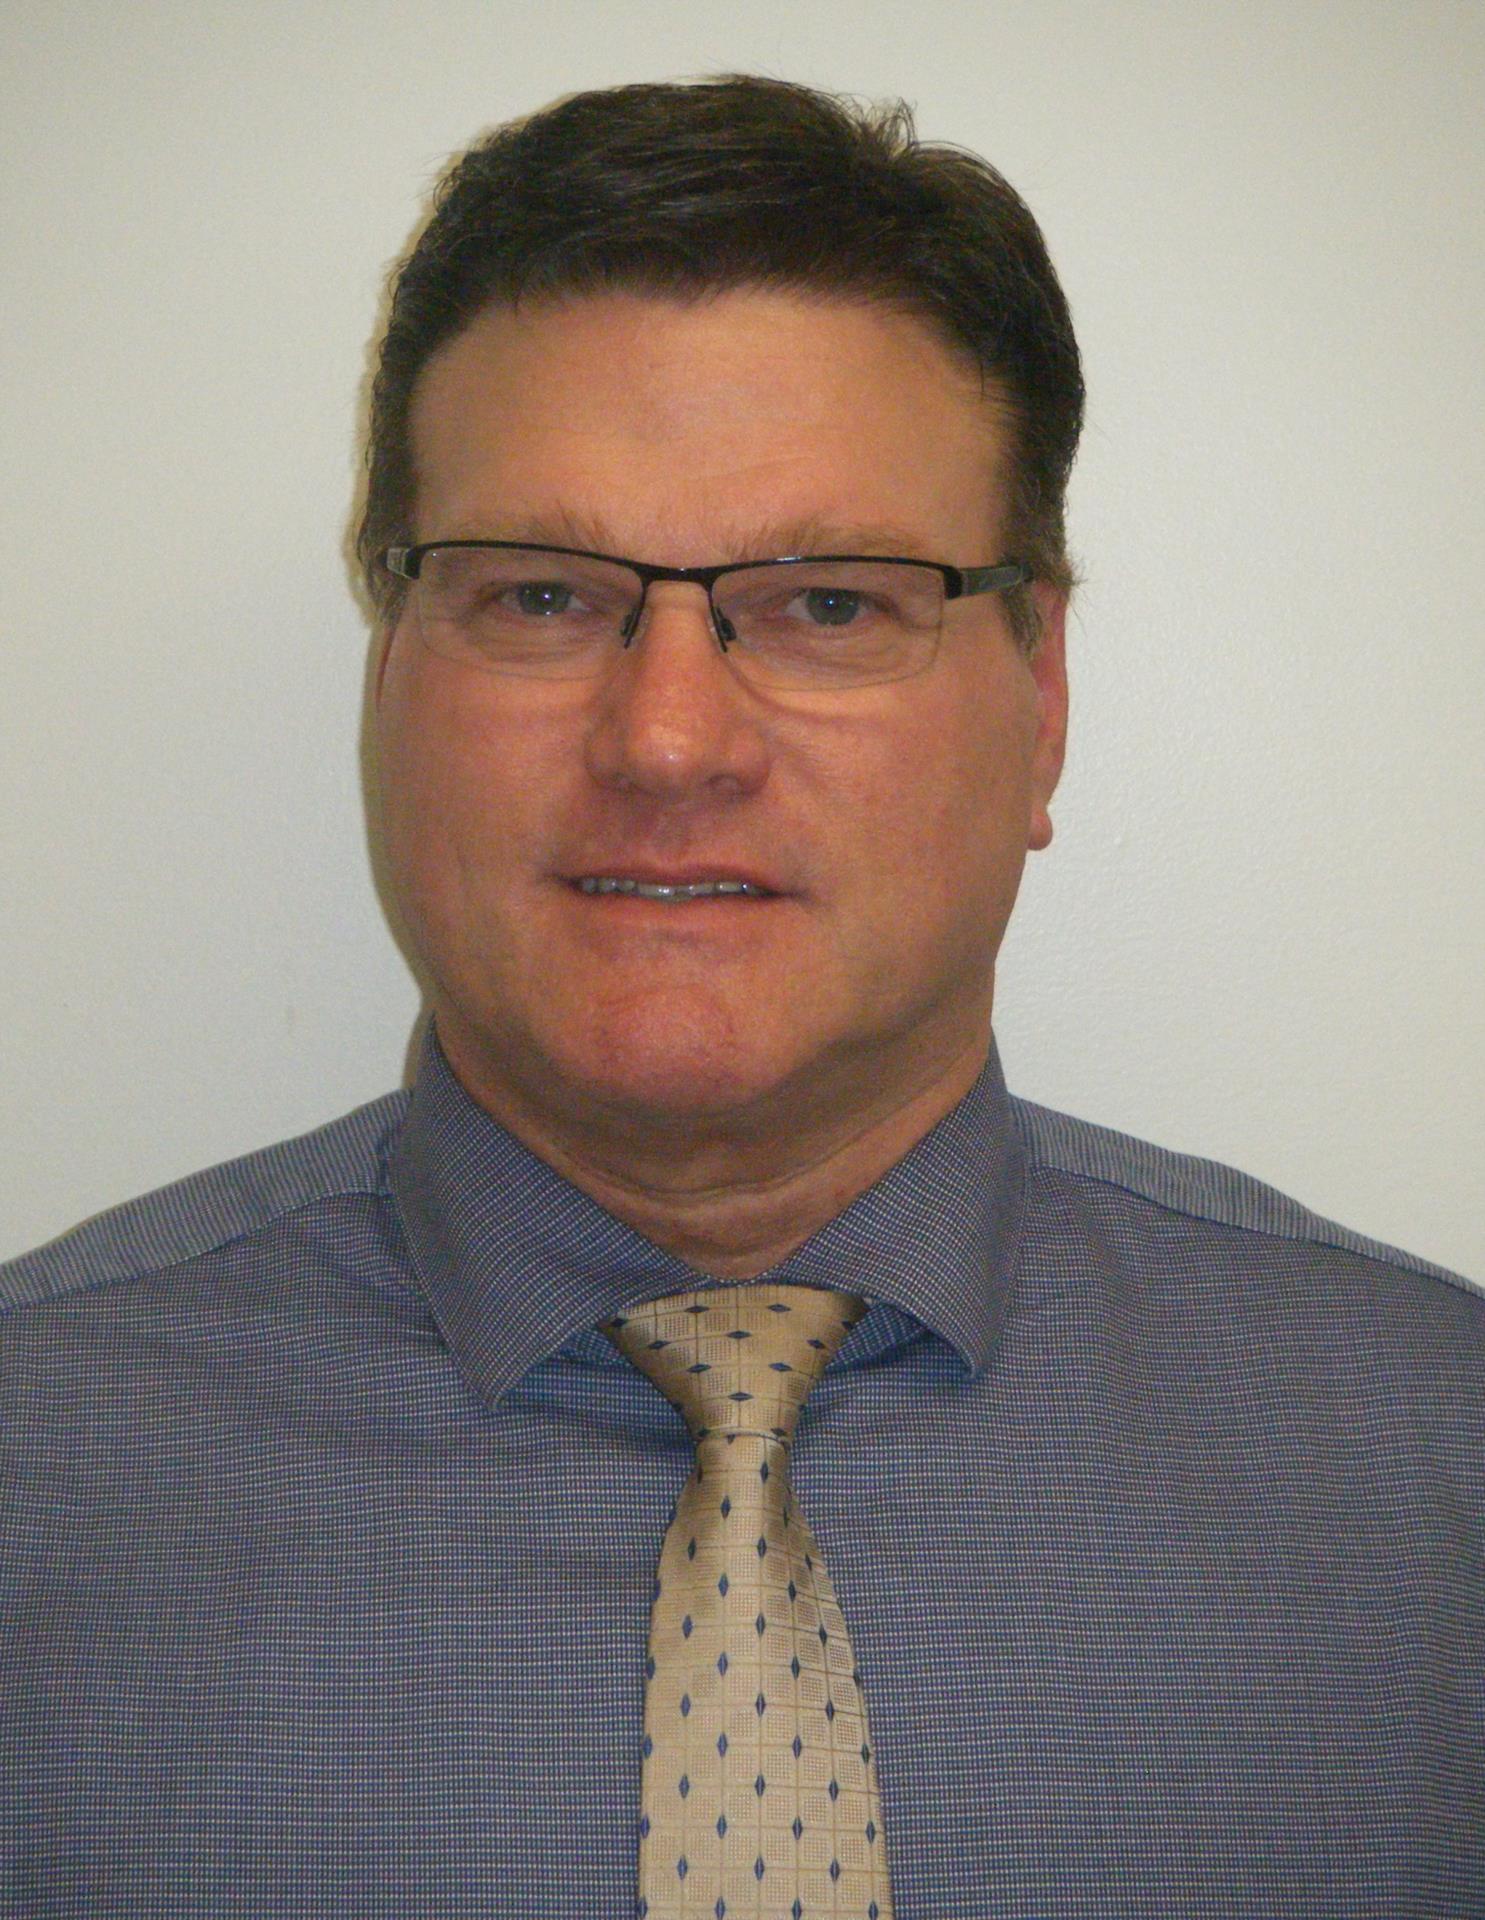 William Loomis Transportation Supervisor